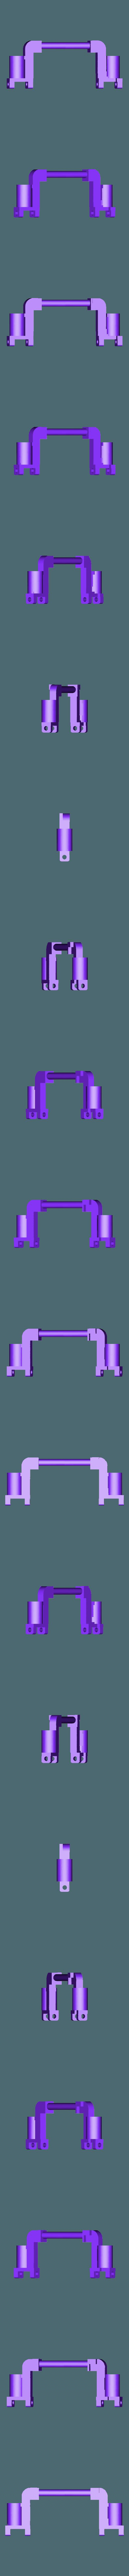 sebire4.stl Download free STL file Small Humanoid Robot • 3D printable design, choimoni